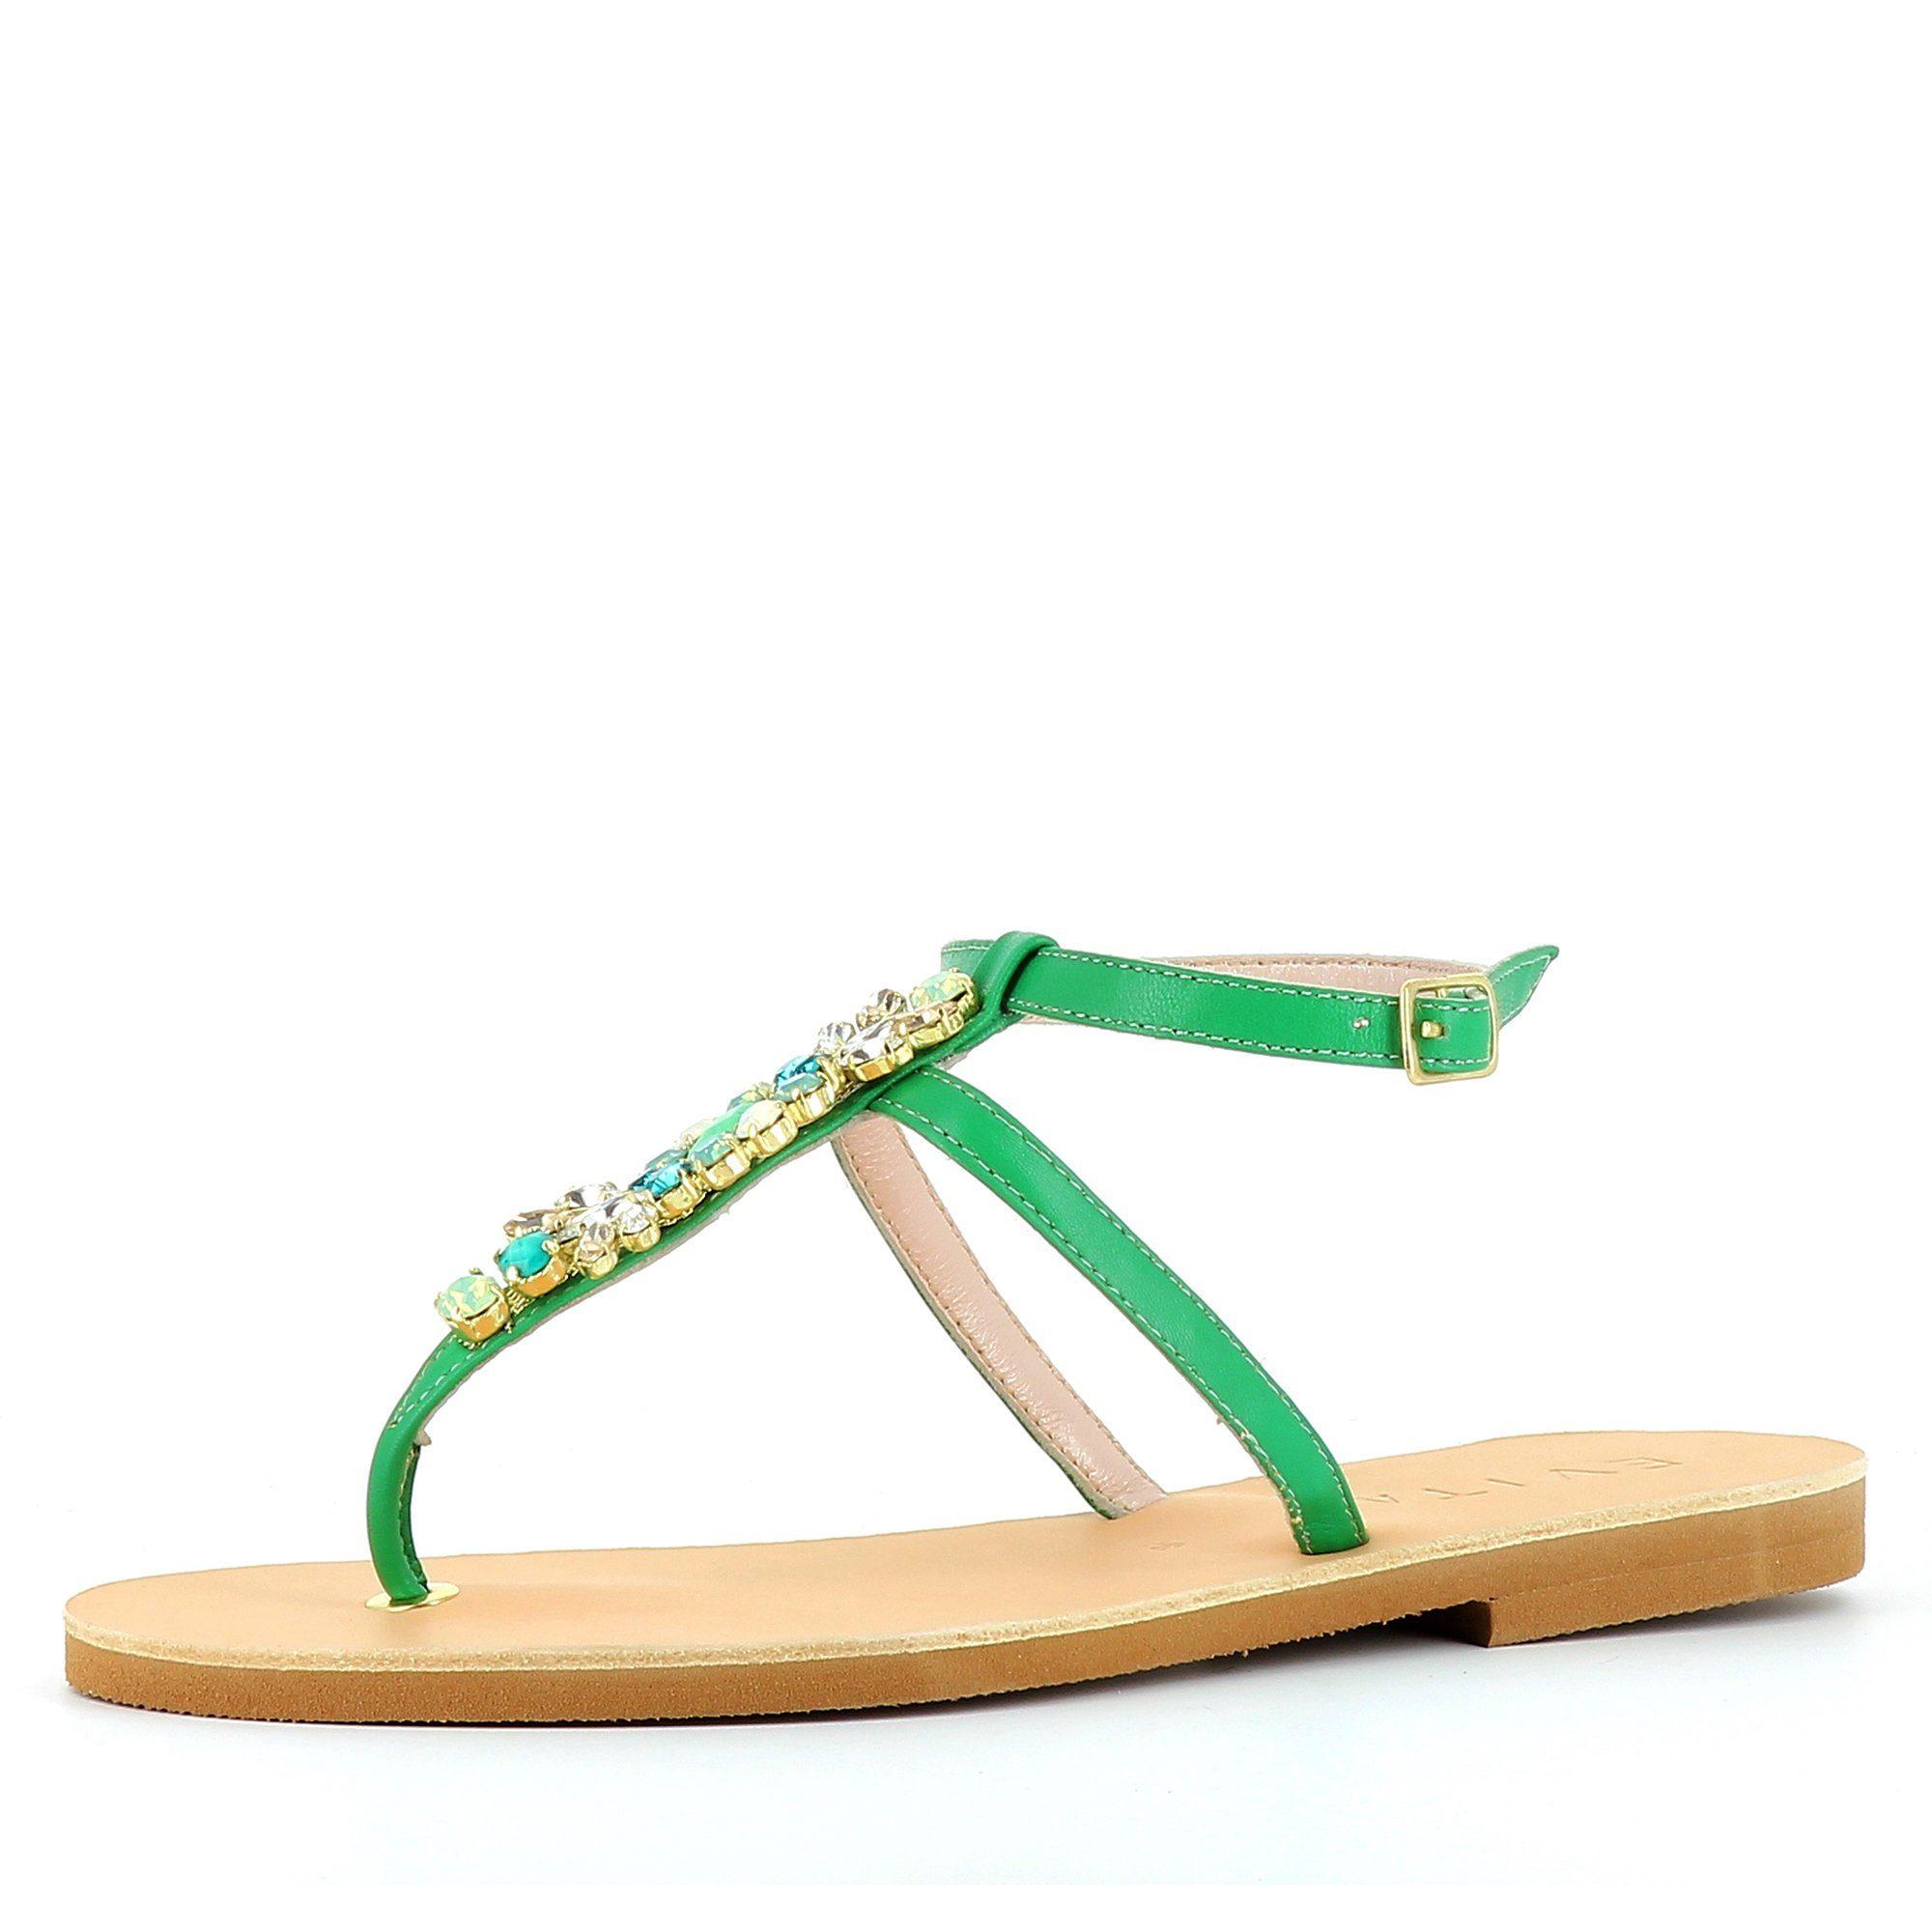 Evita GRETA Riemchensandalette, Sandale kaufen  grün